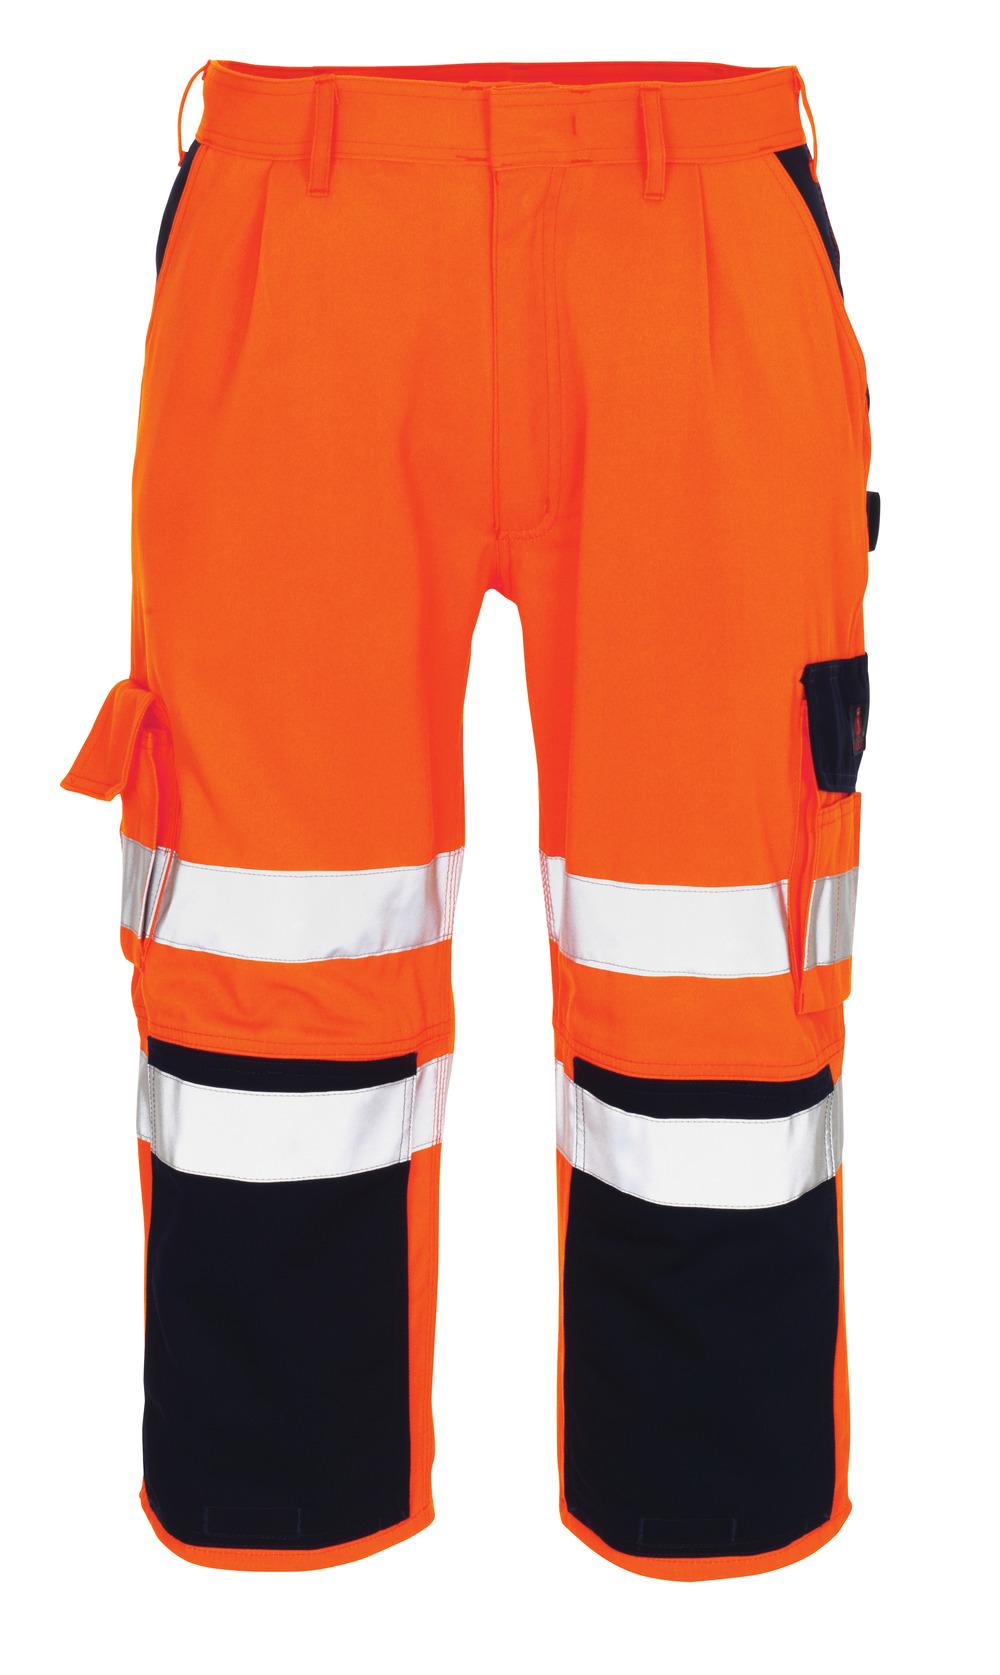 07149-860-141 Knickers med knælommer - hi-vis orange/marine